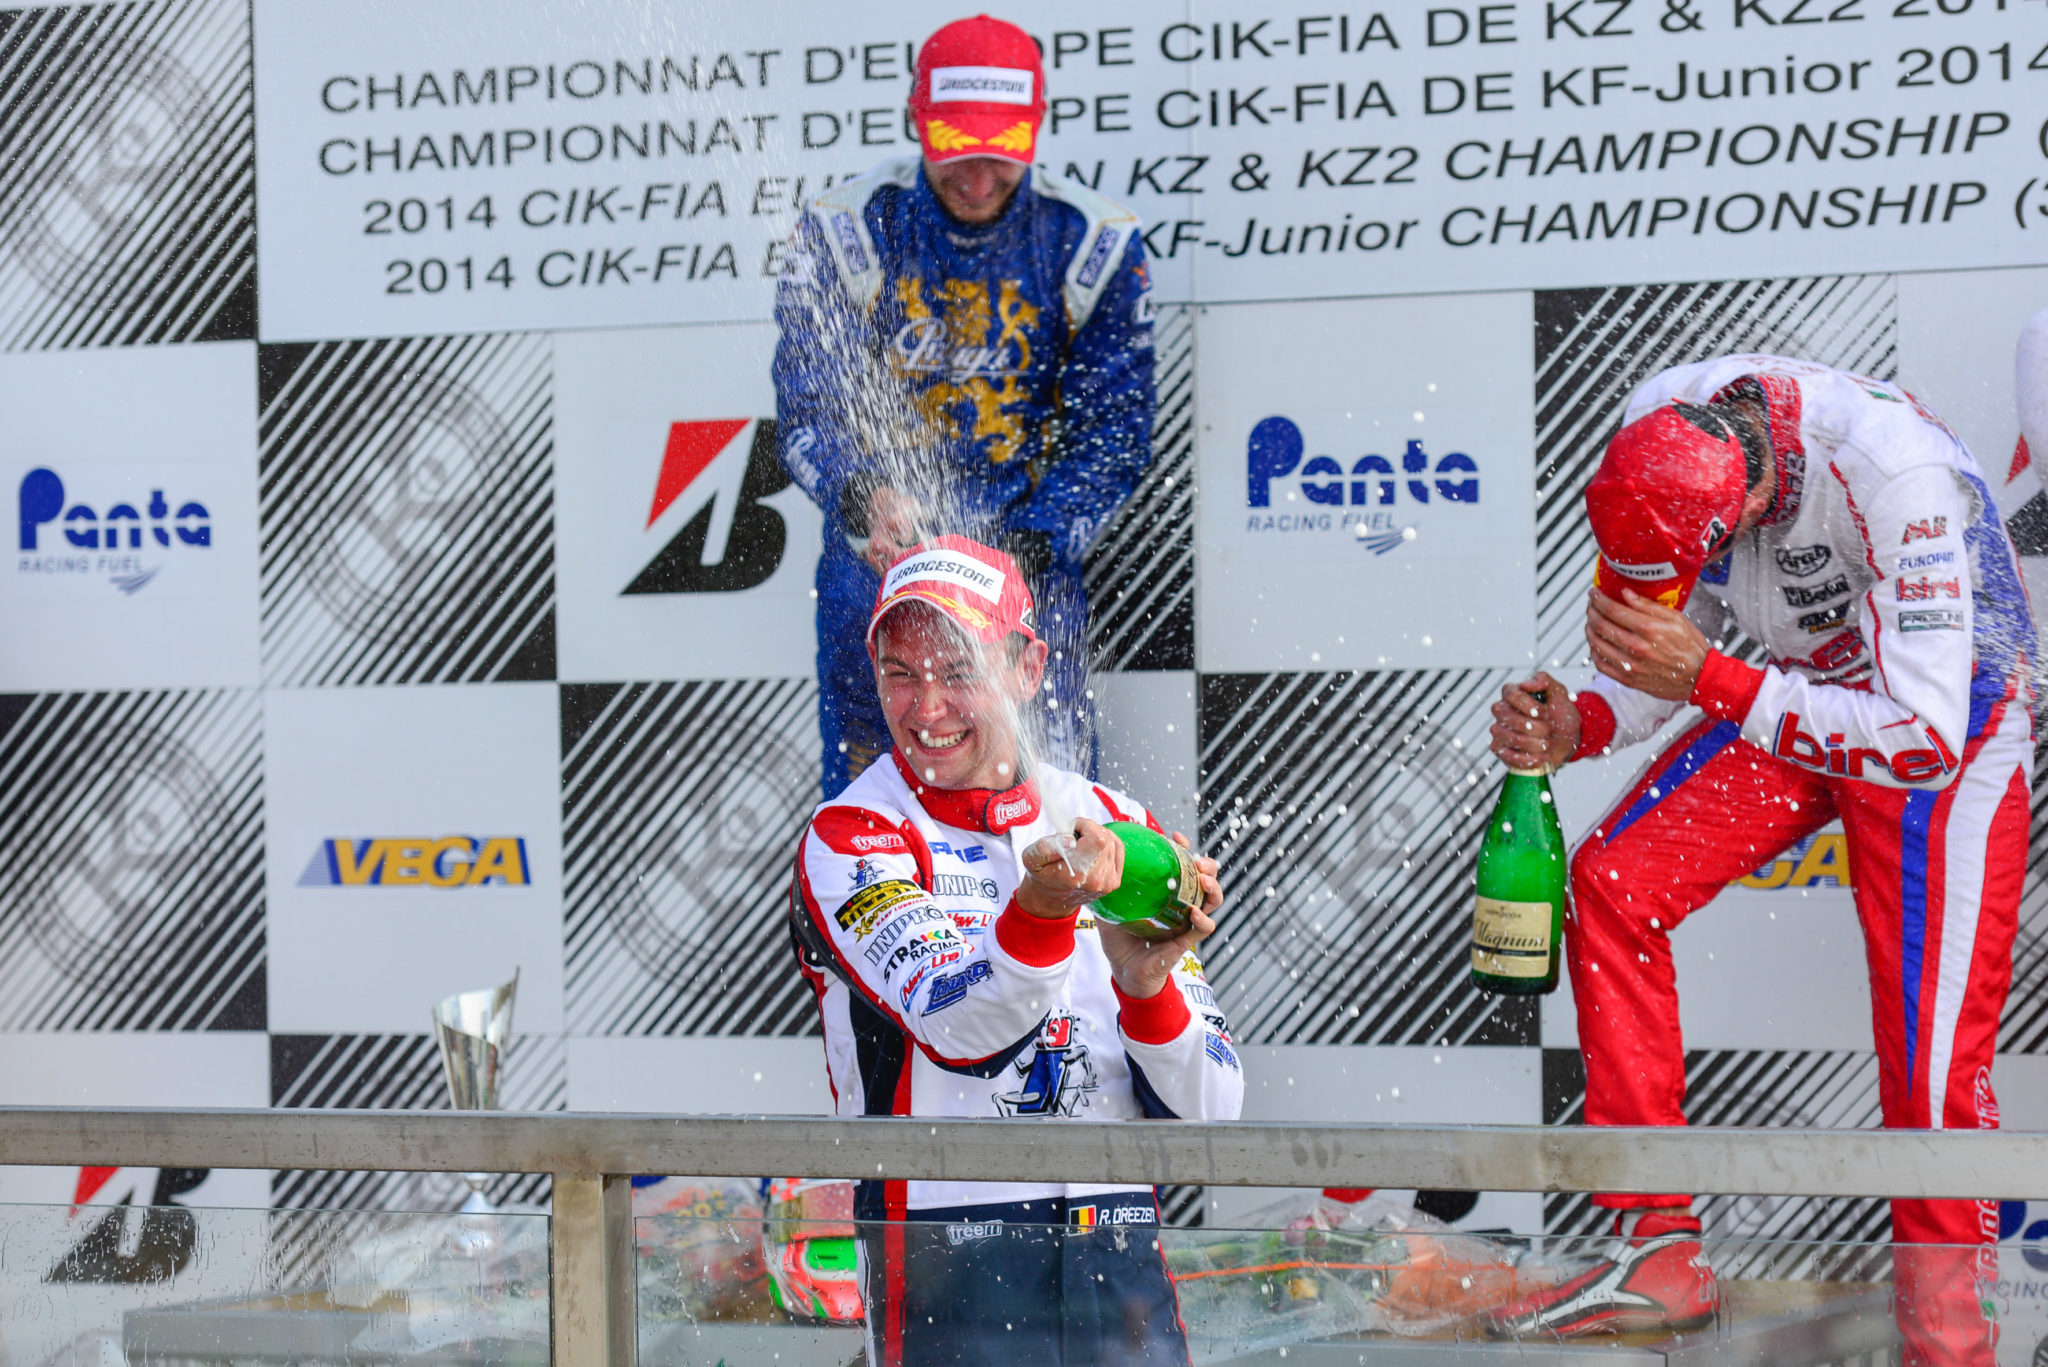 Rick Dreezen chasing first World Championship with Kart Republic